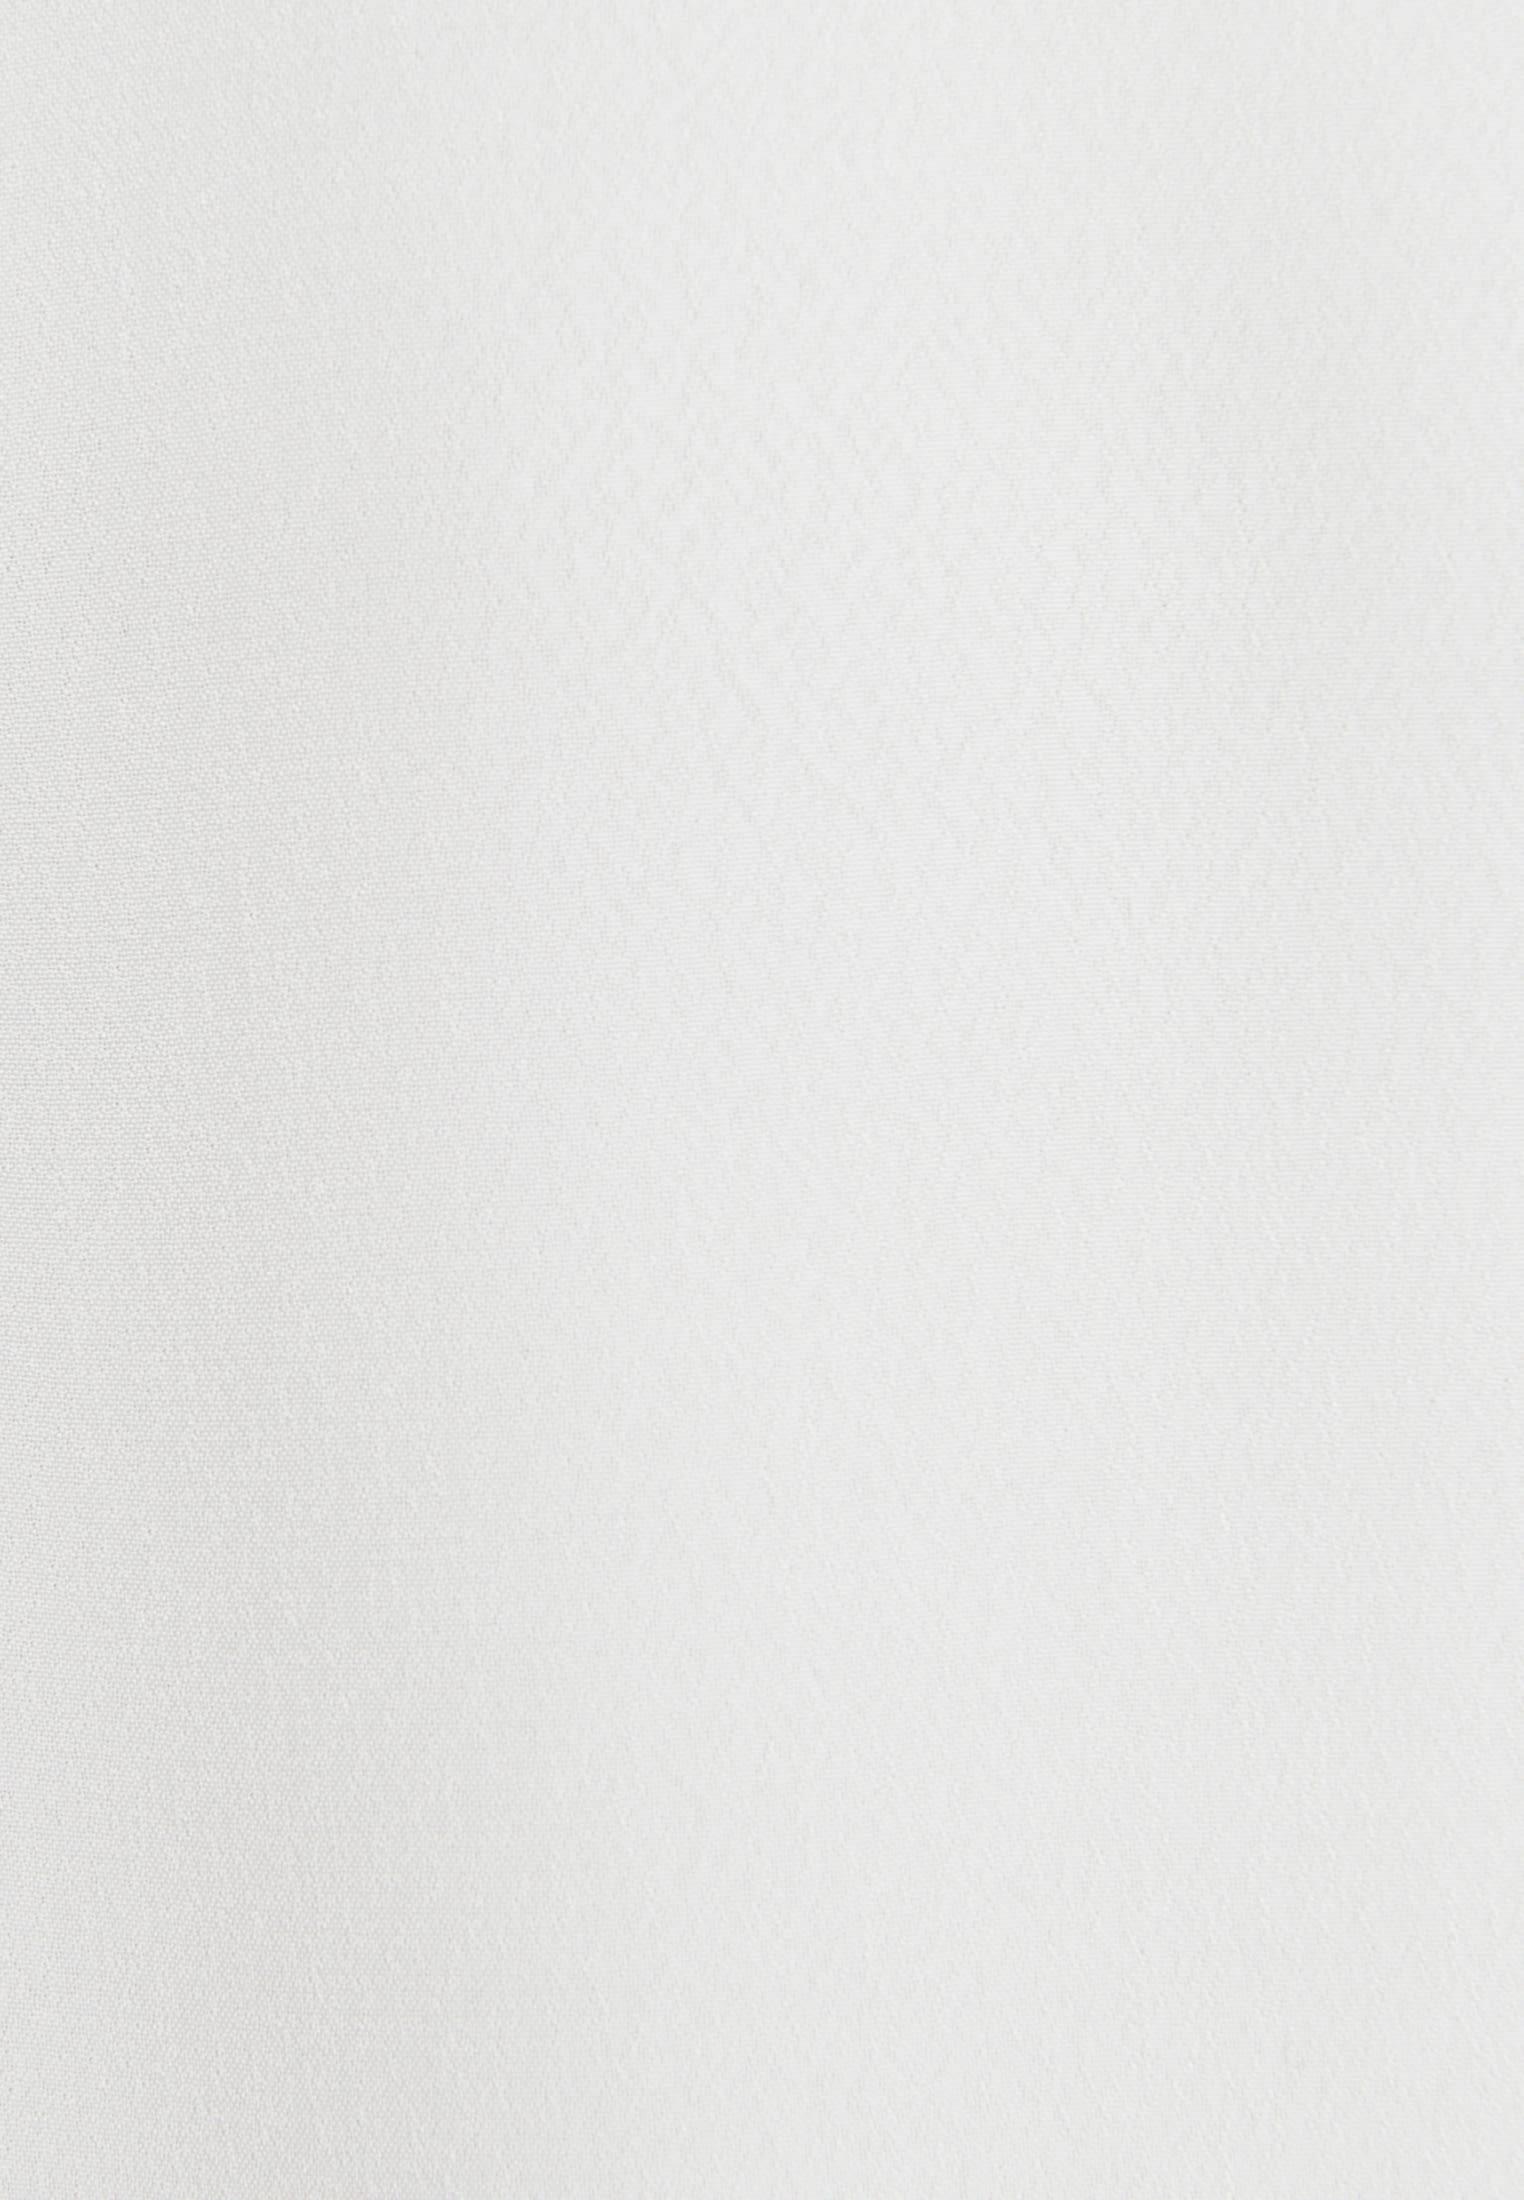 Twill Slip Over Blouse made of 100% Viscose in Ecru |  Seidensticker Onlineshop